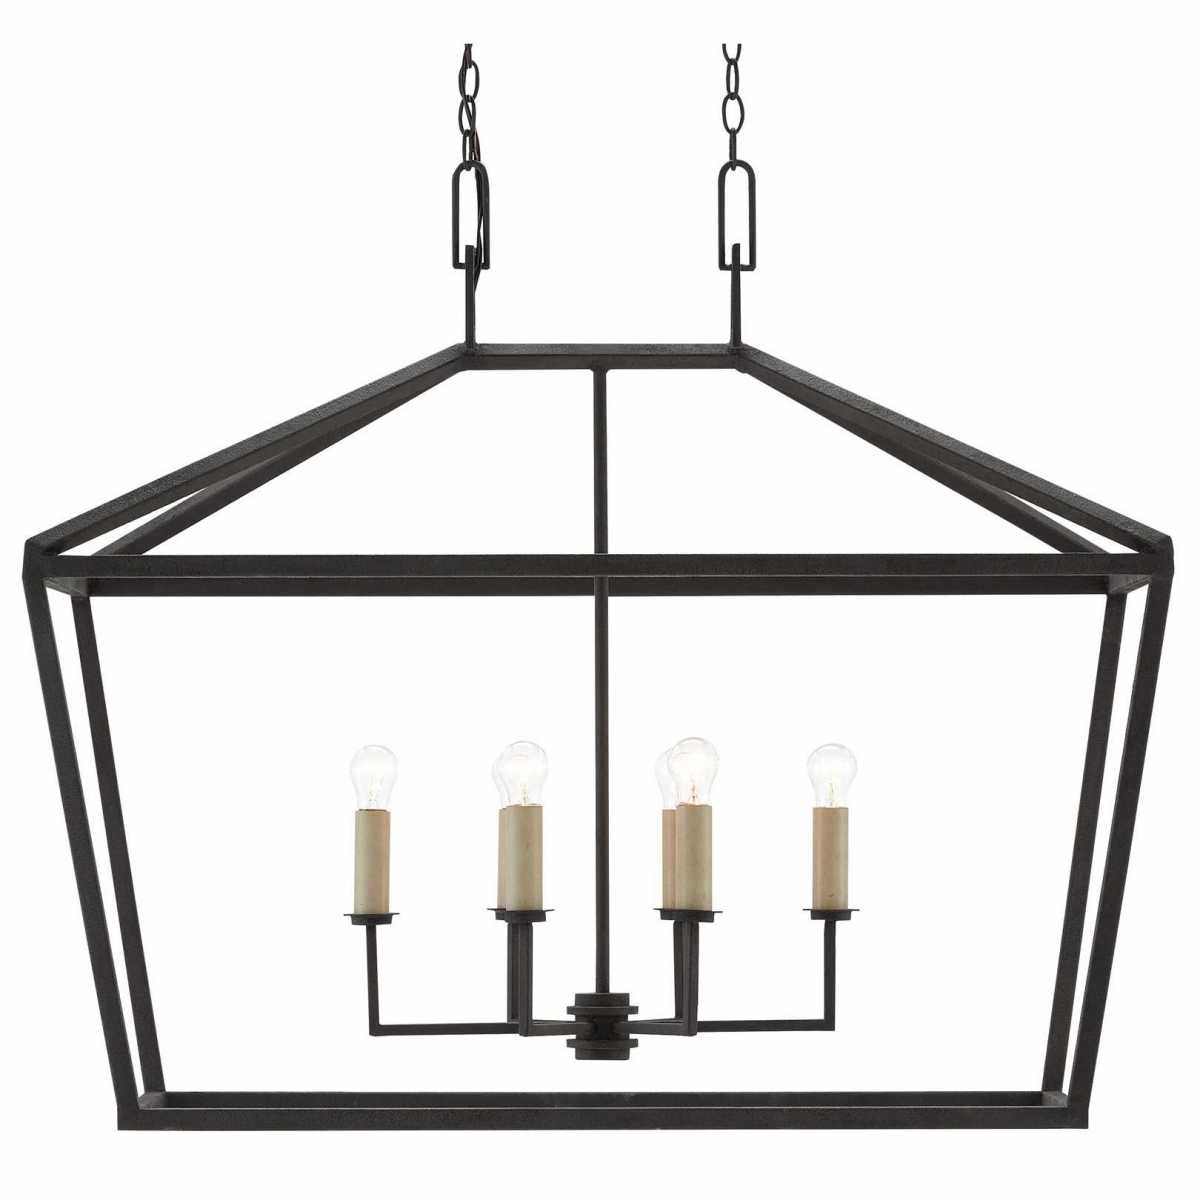 Currey And Company Denison Rectangular Lantern Chandeliers